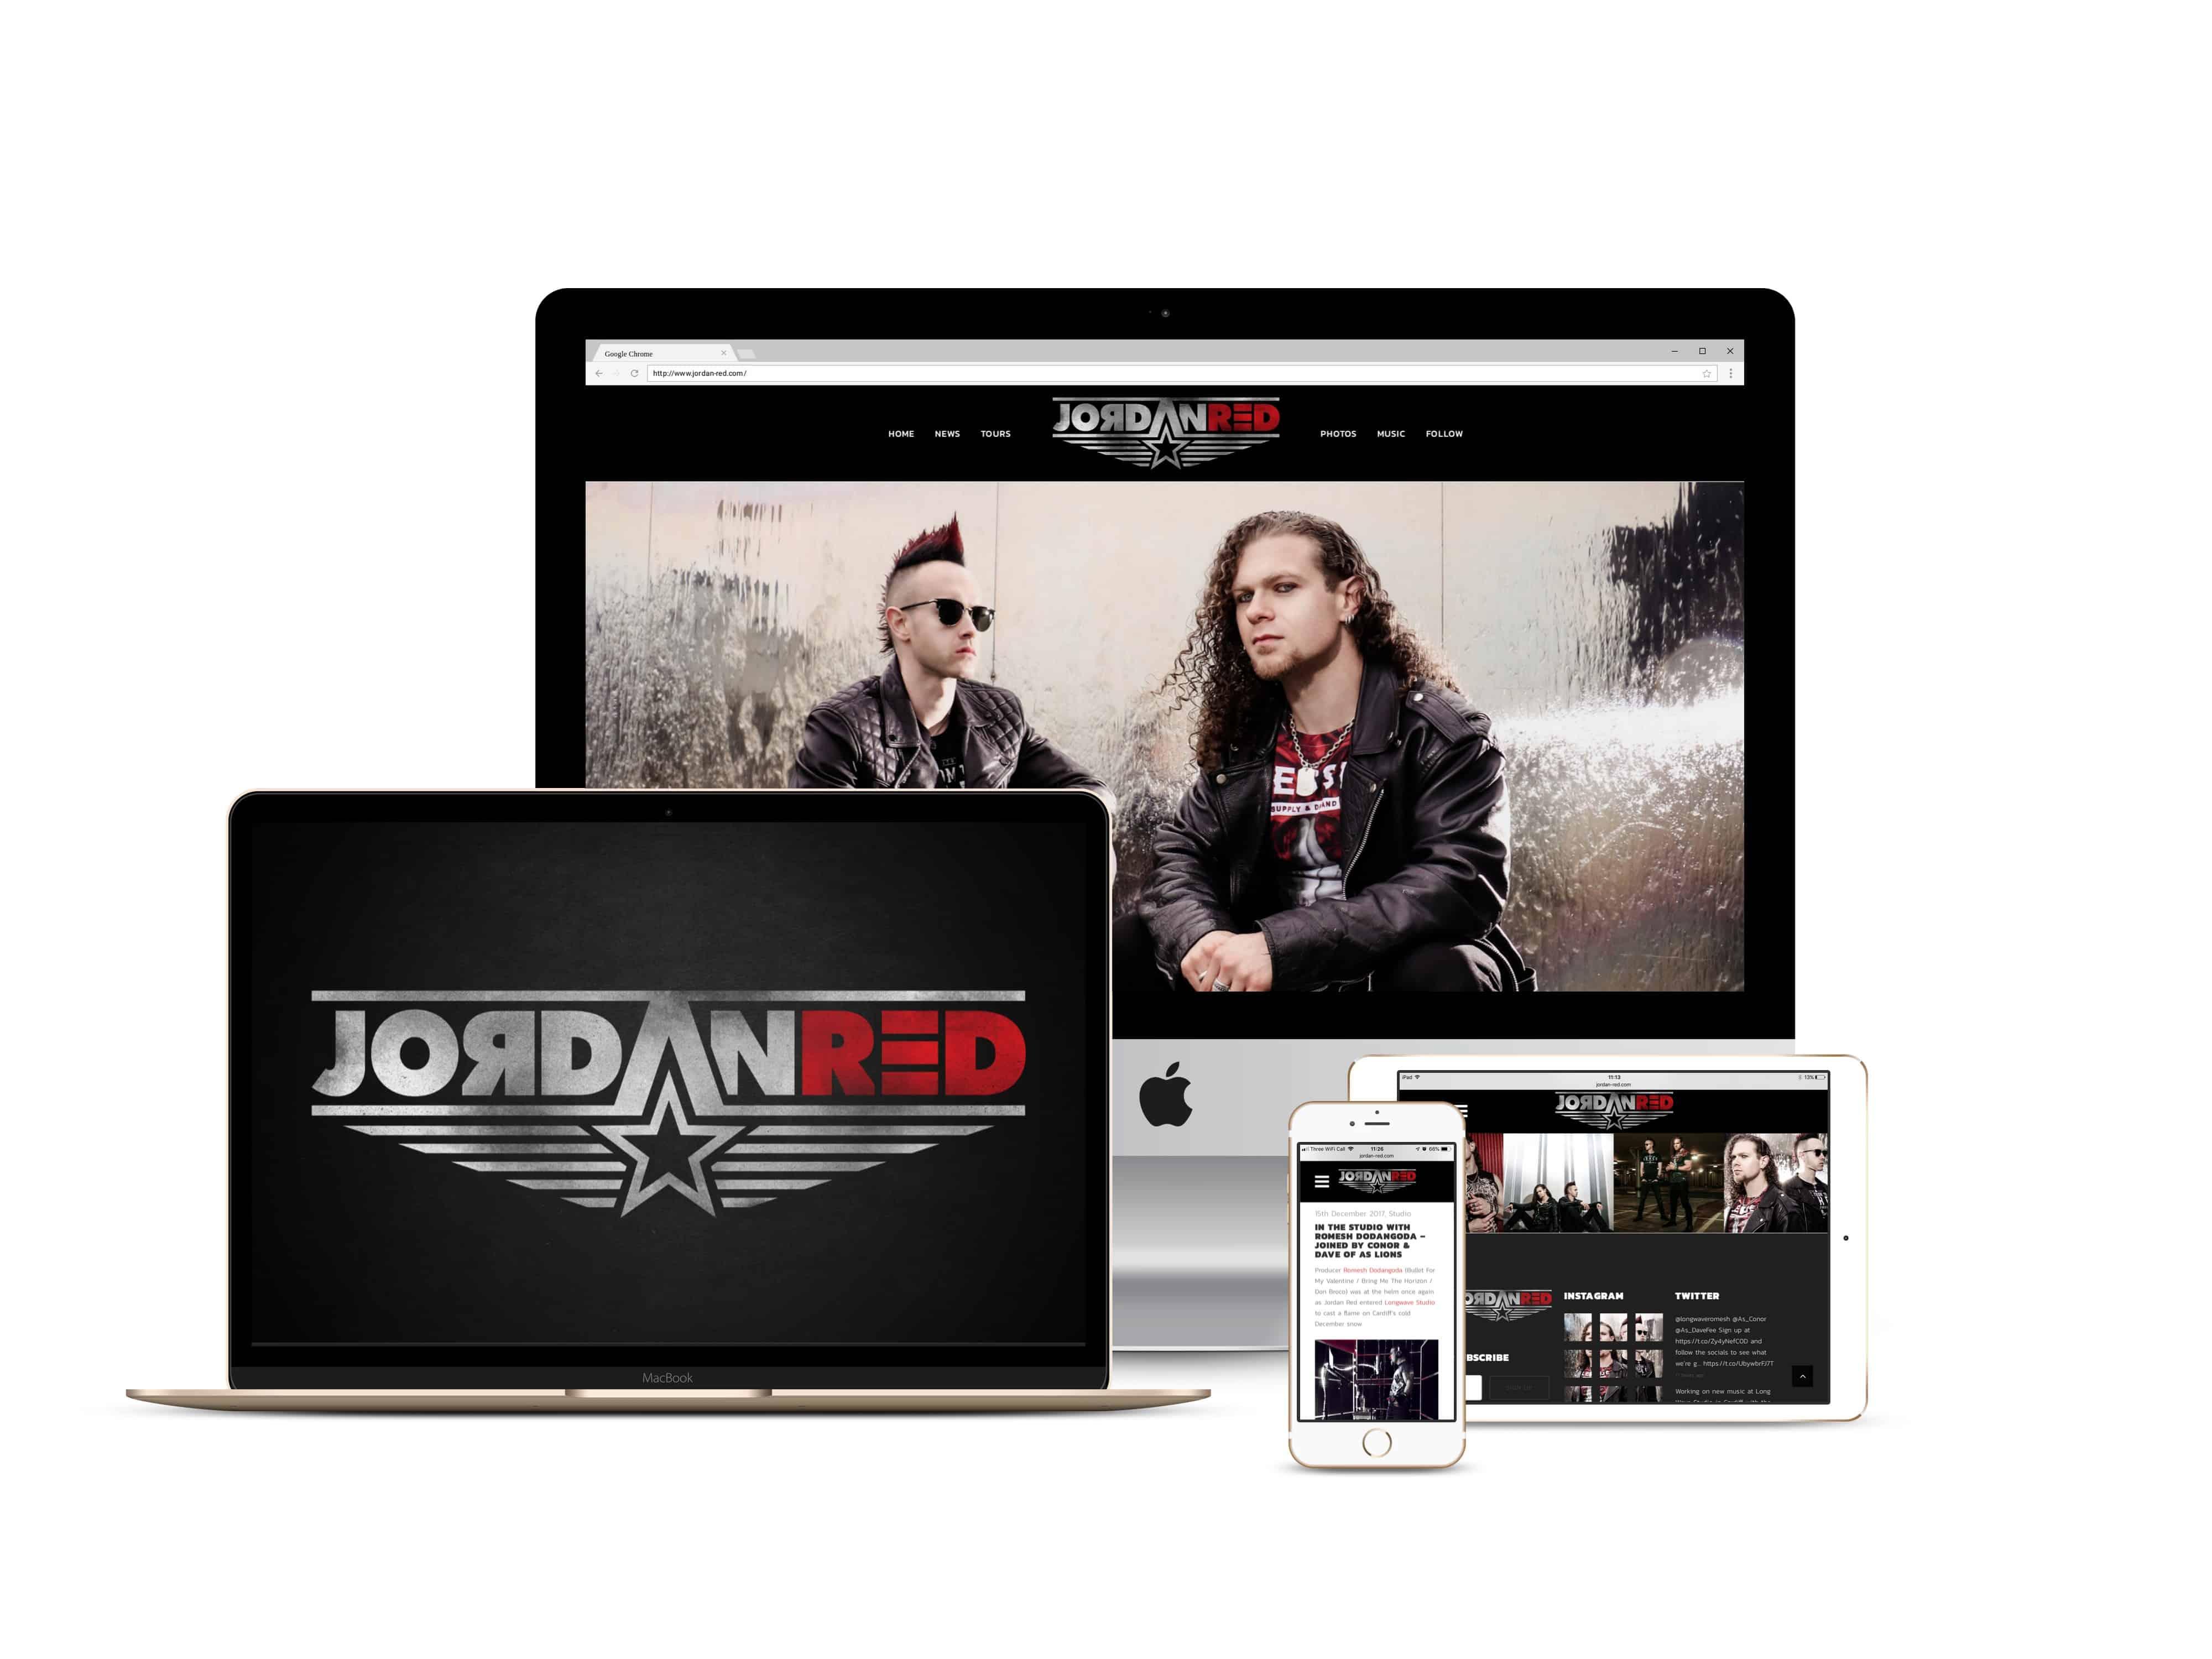 Jordan Red uses CWDmedia